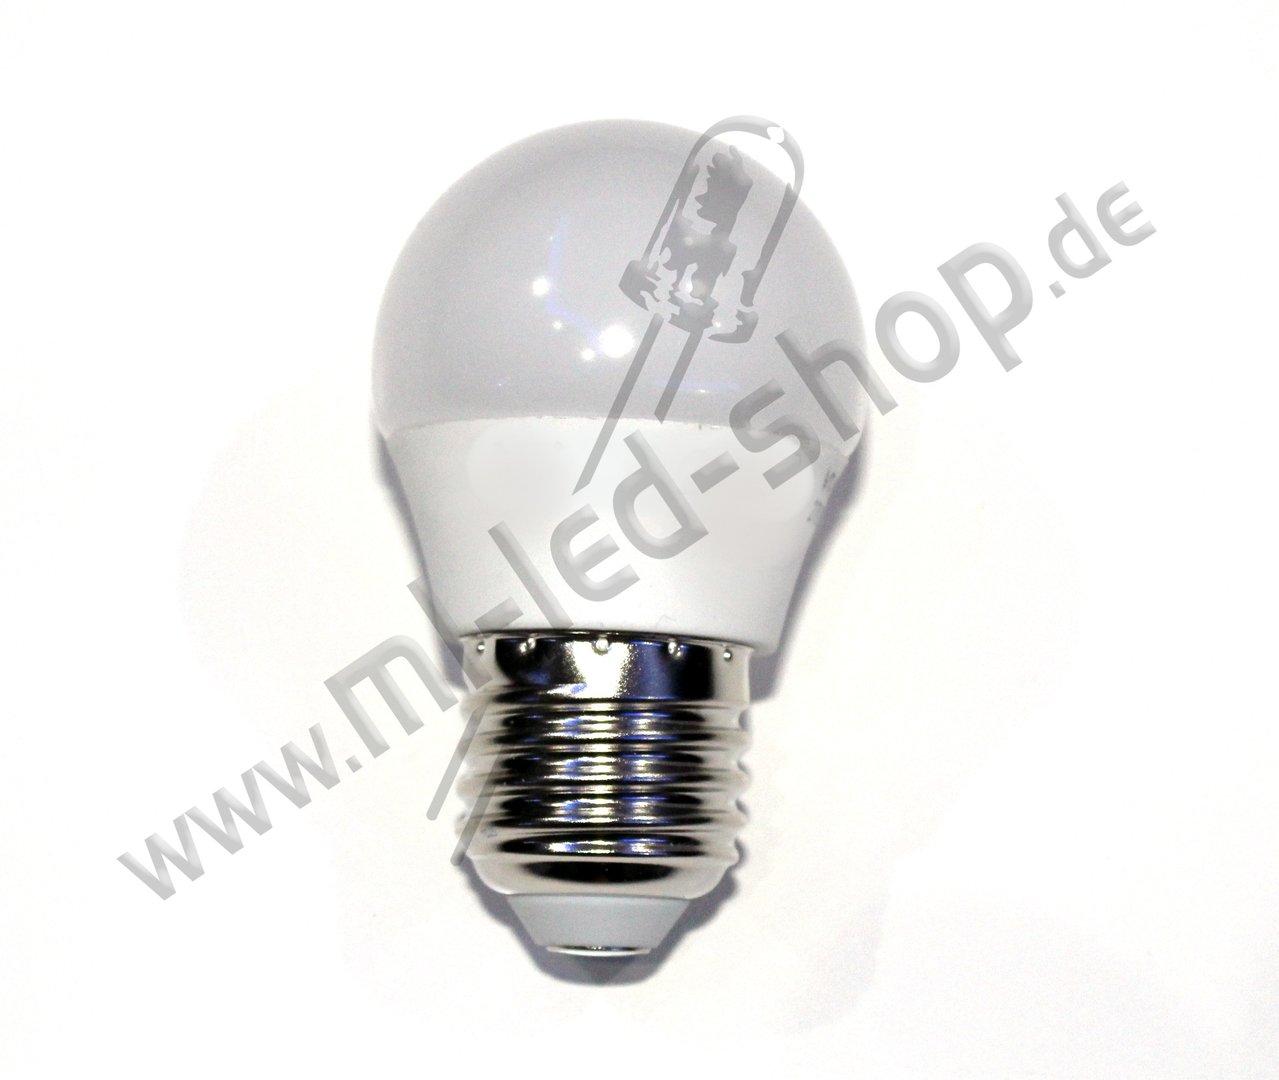 6 watt e27 led leuchtmittel 2700k warm wei g45. Black Bedroom Furniture Sets. Home Design Ideas